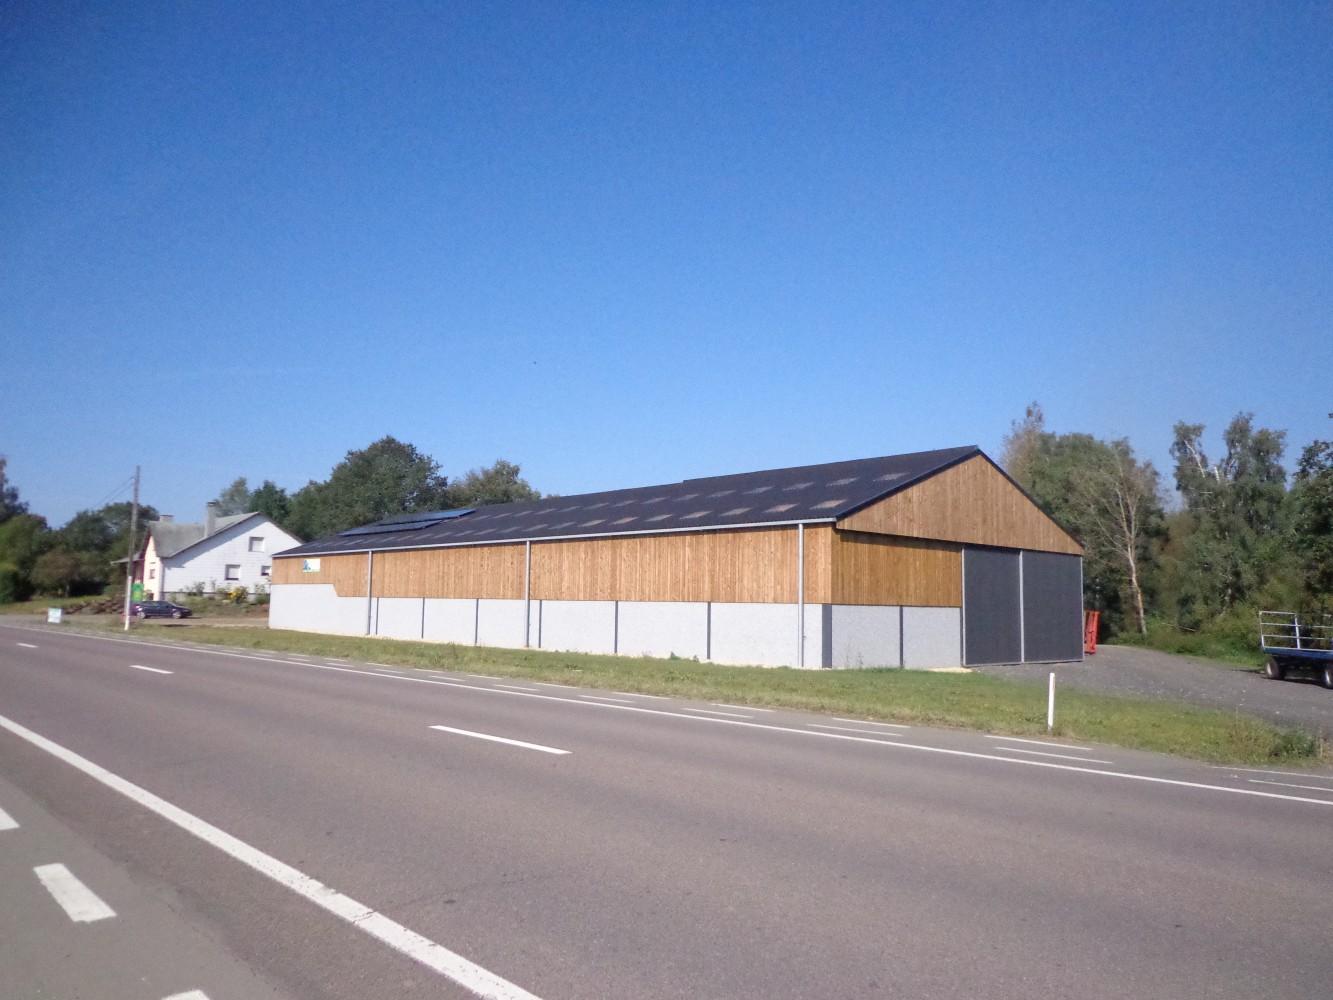 Hangar agricole simonet art chi made for Architecte batiment agricole